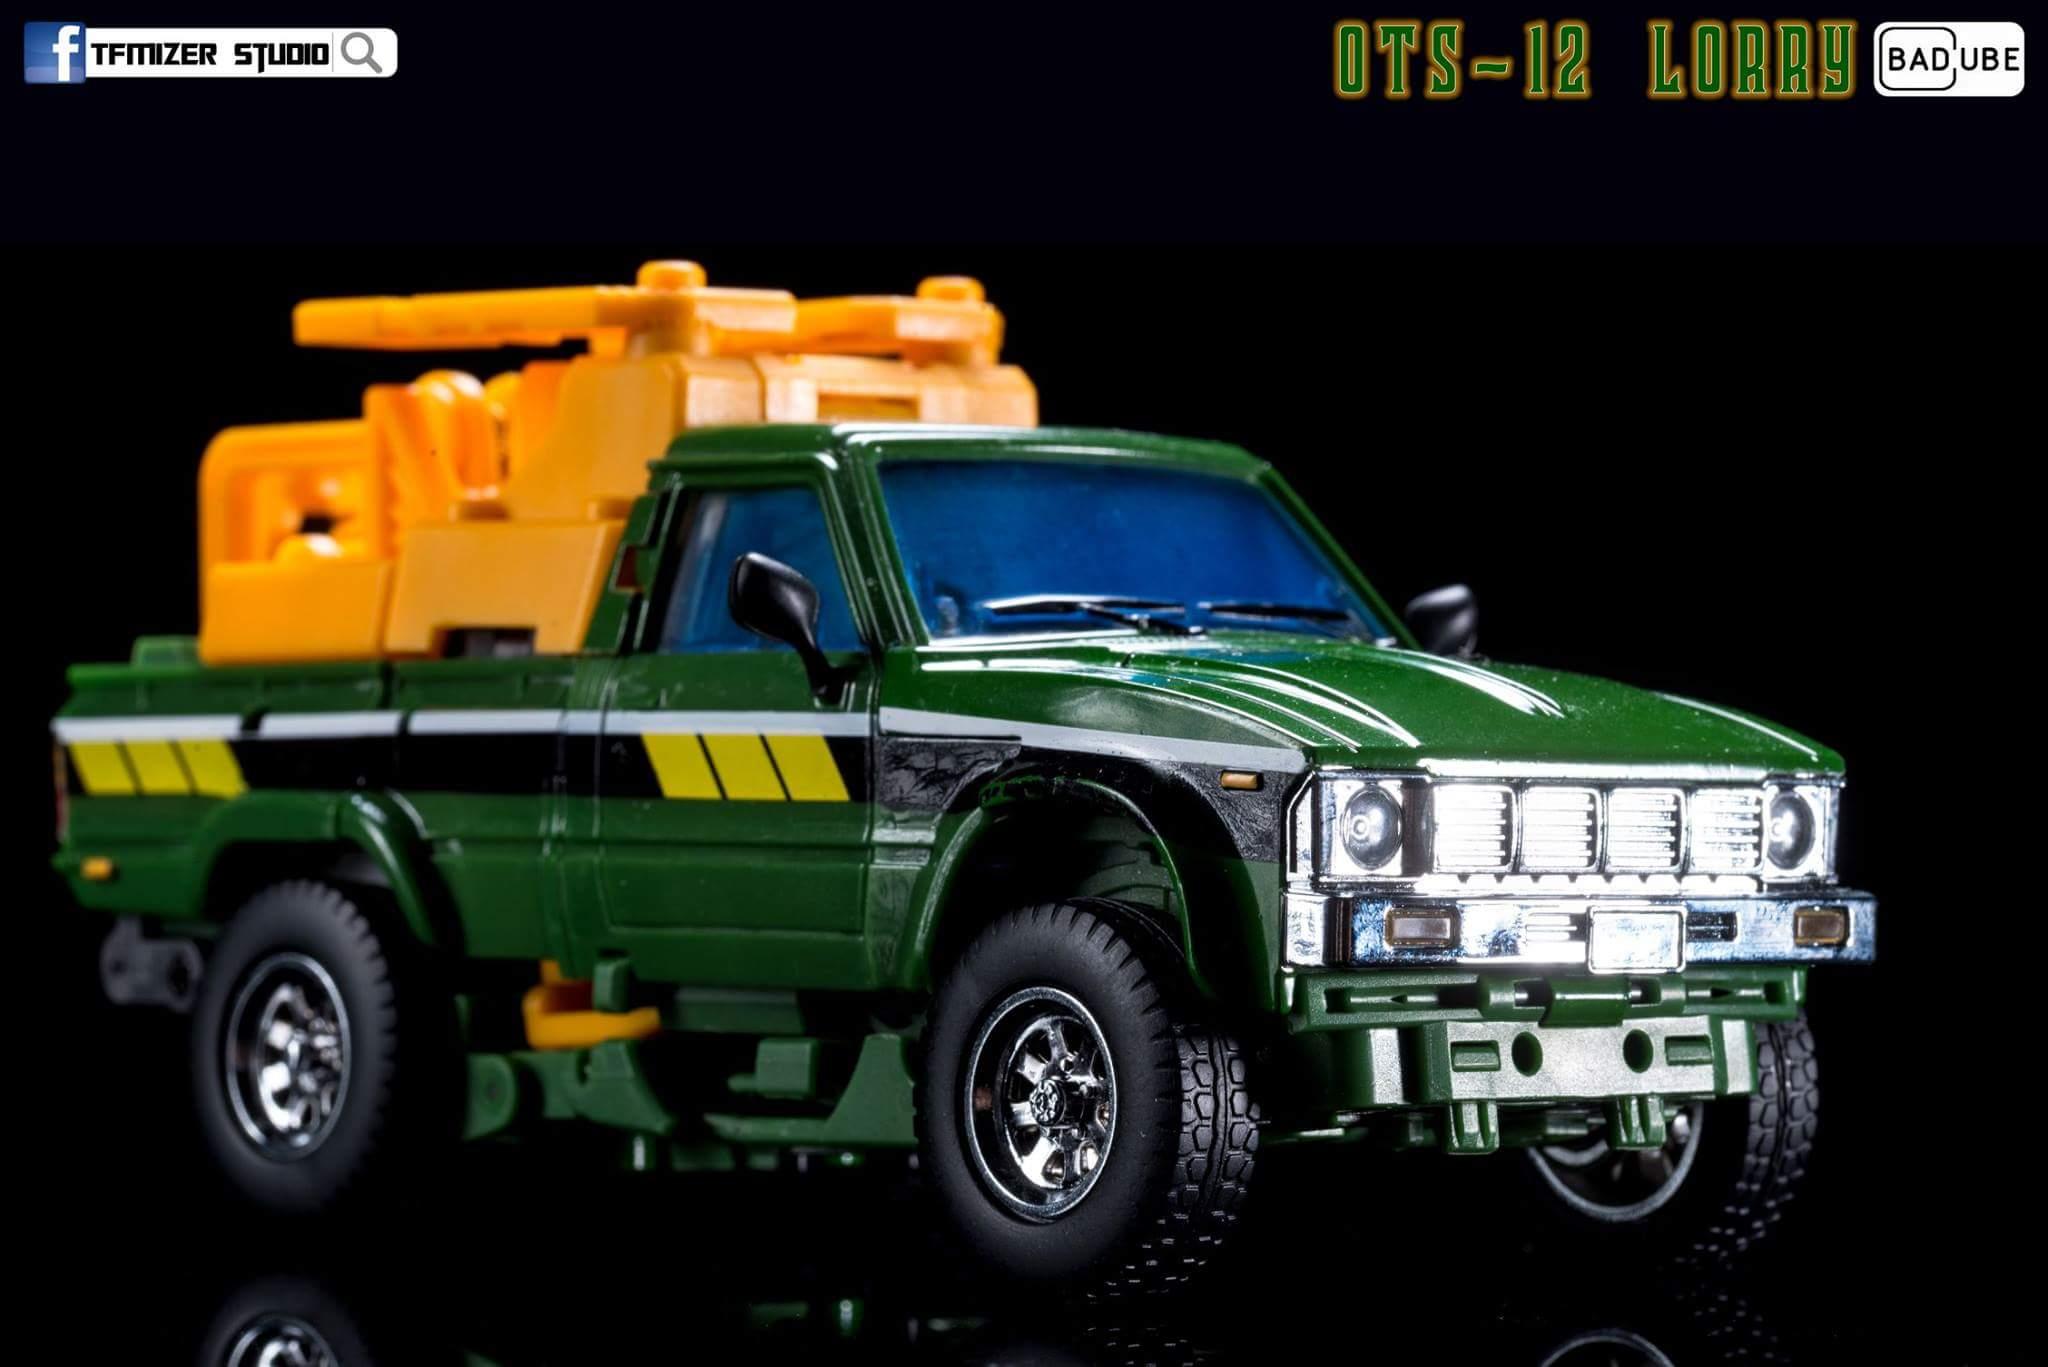 [BadCube] Produit Tiers - Jouet OTS-12 Lorry - aka Hoist/Treuil KJoL383f